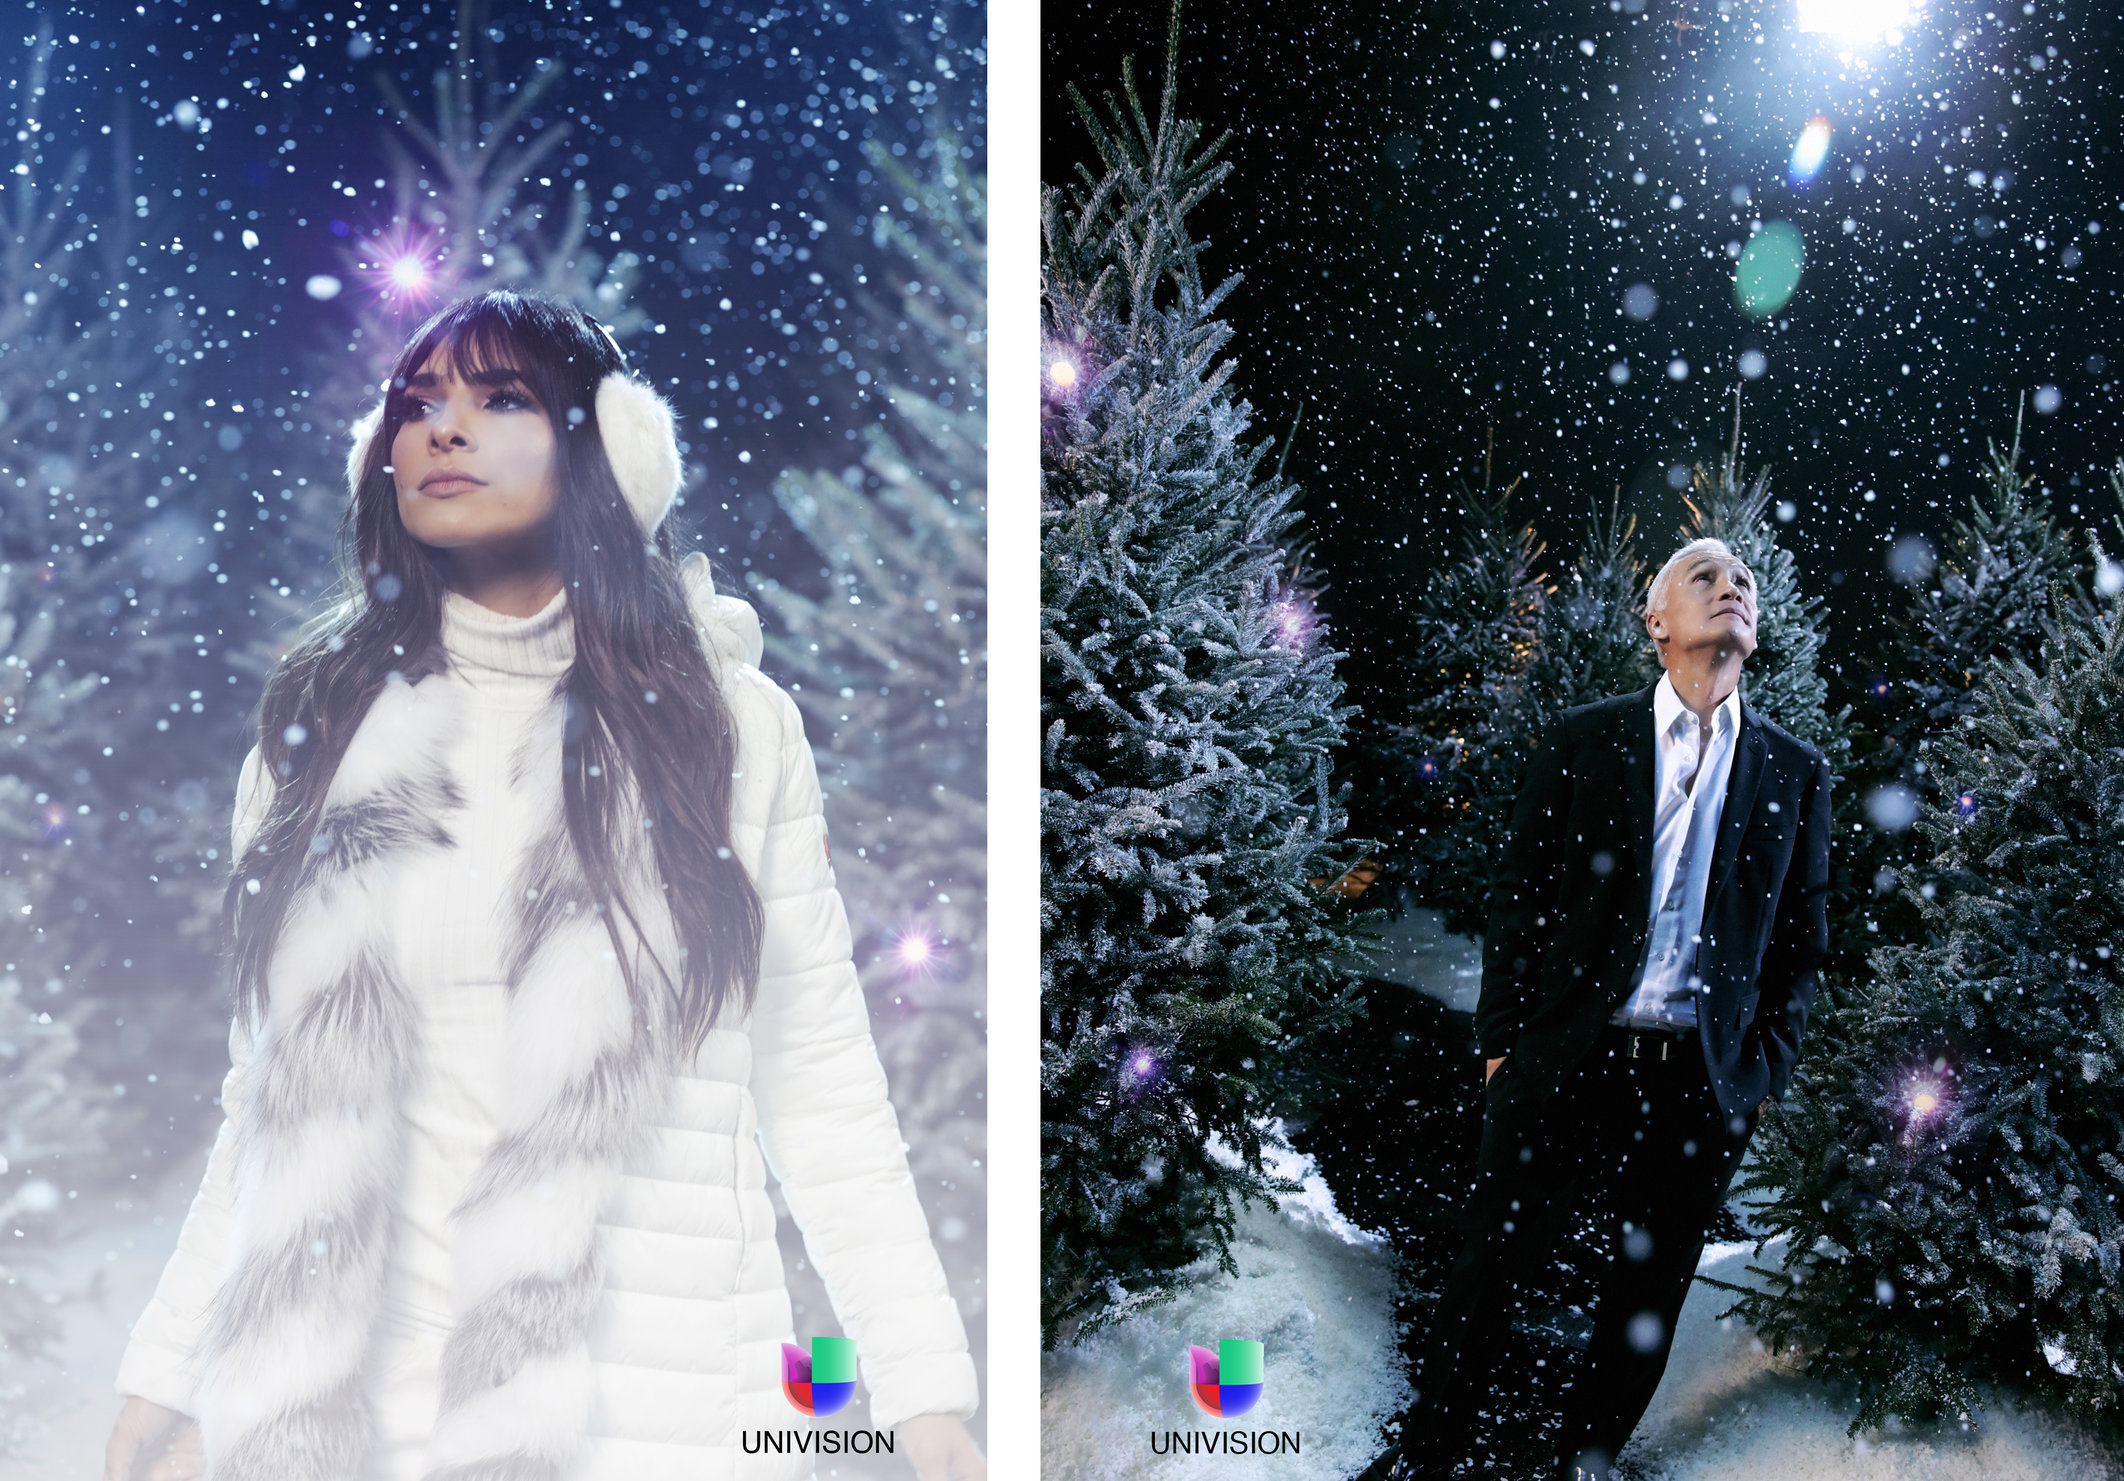 univision-holiday-ad.jpg